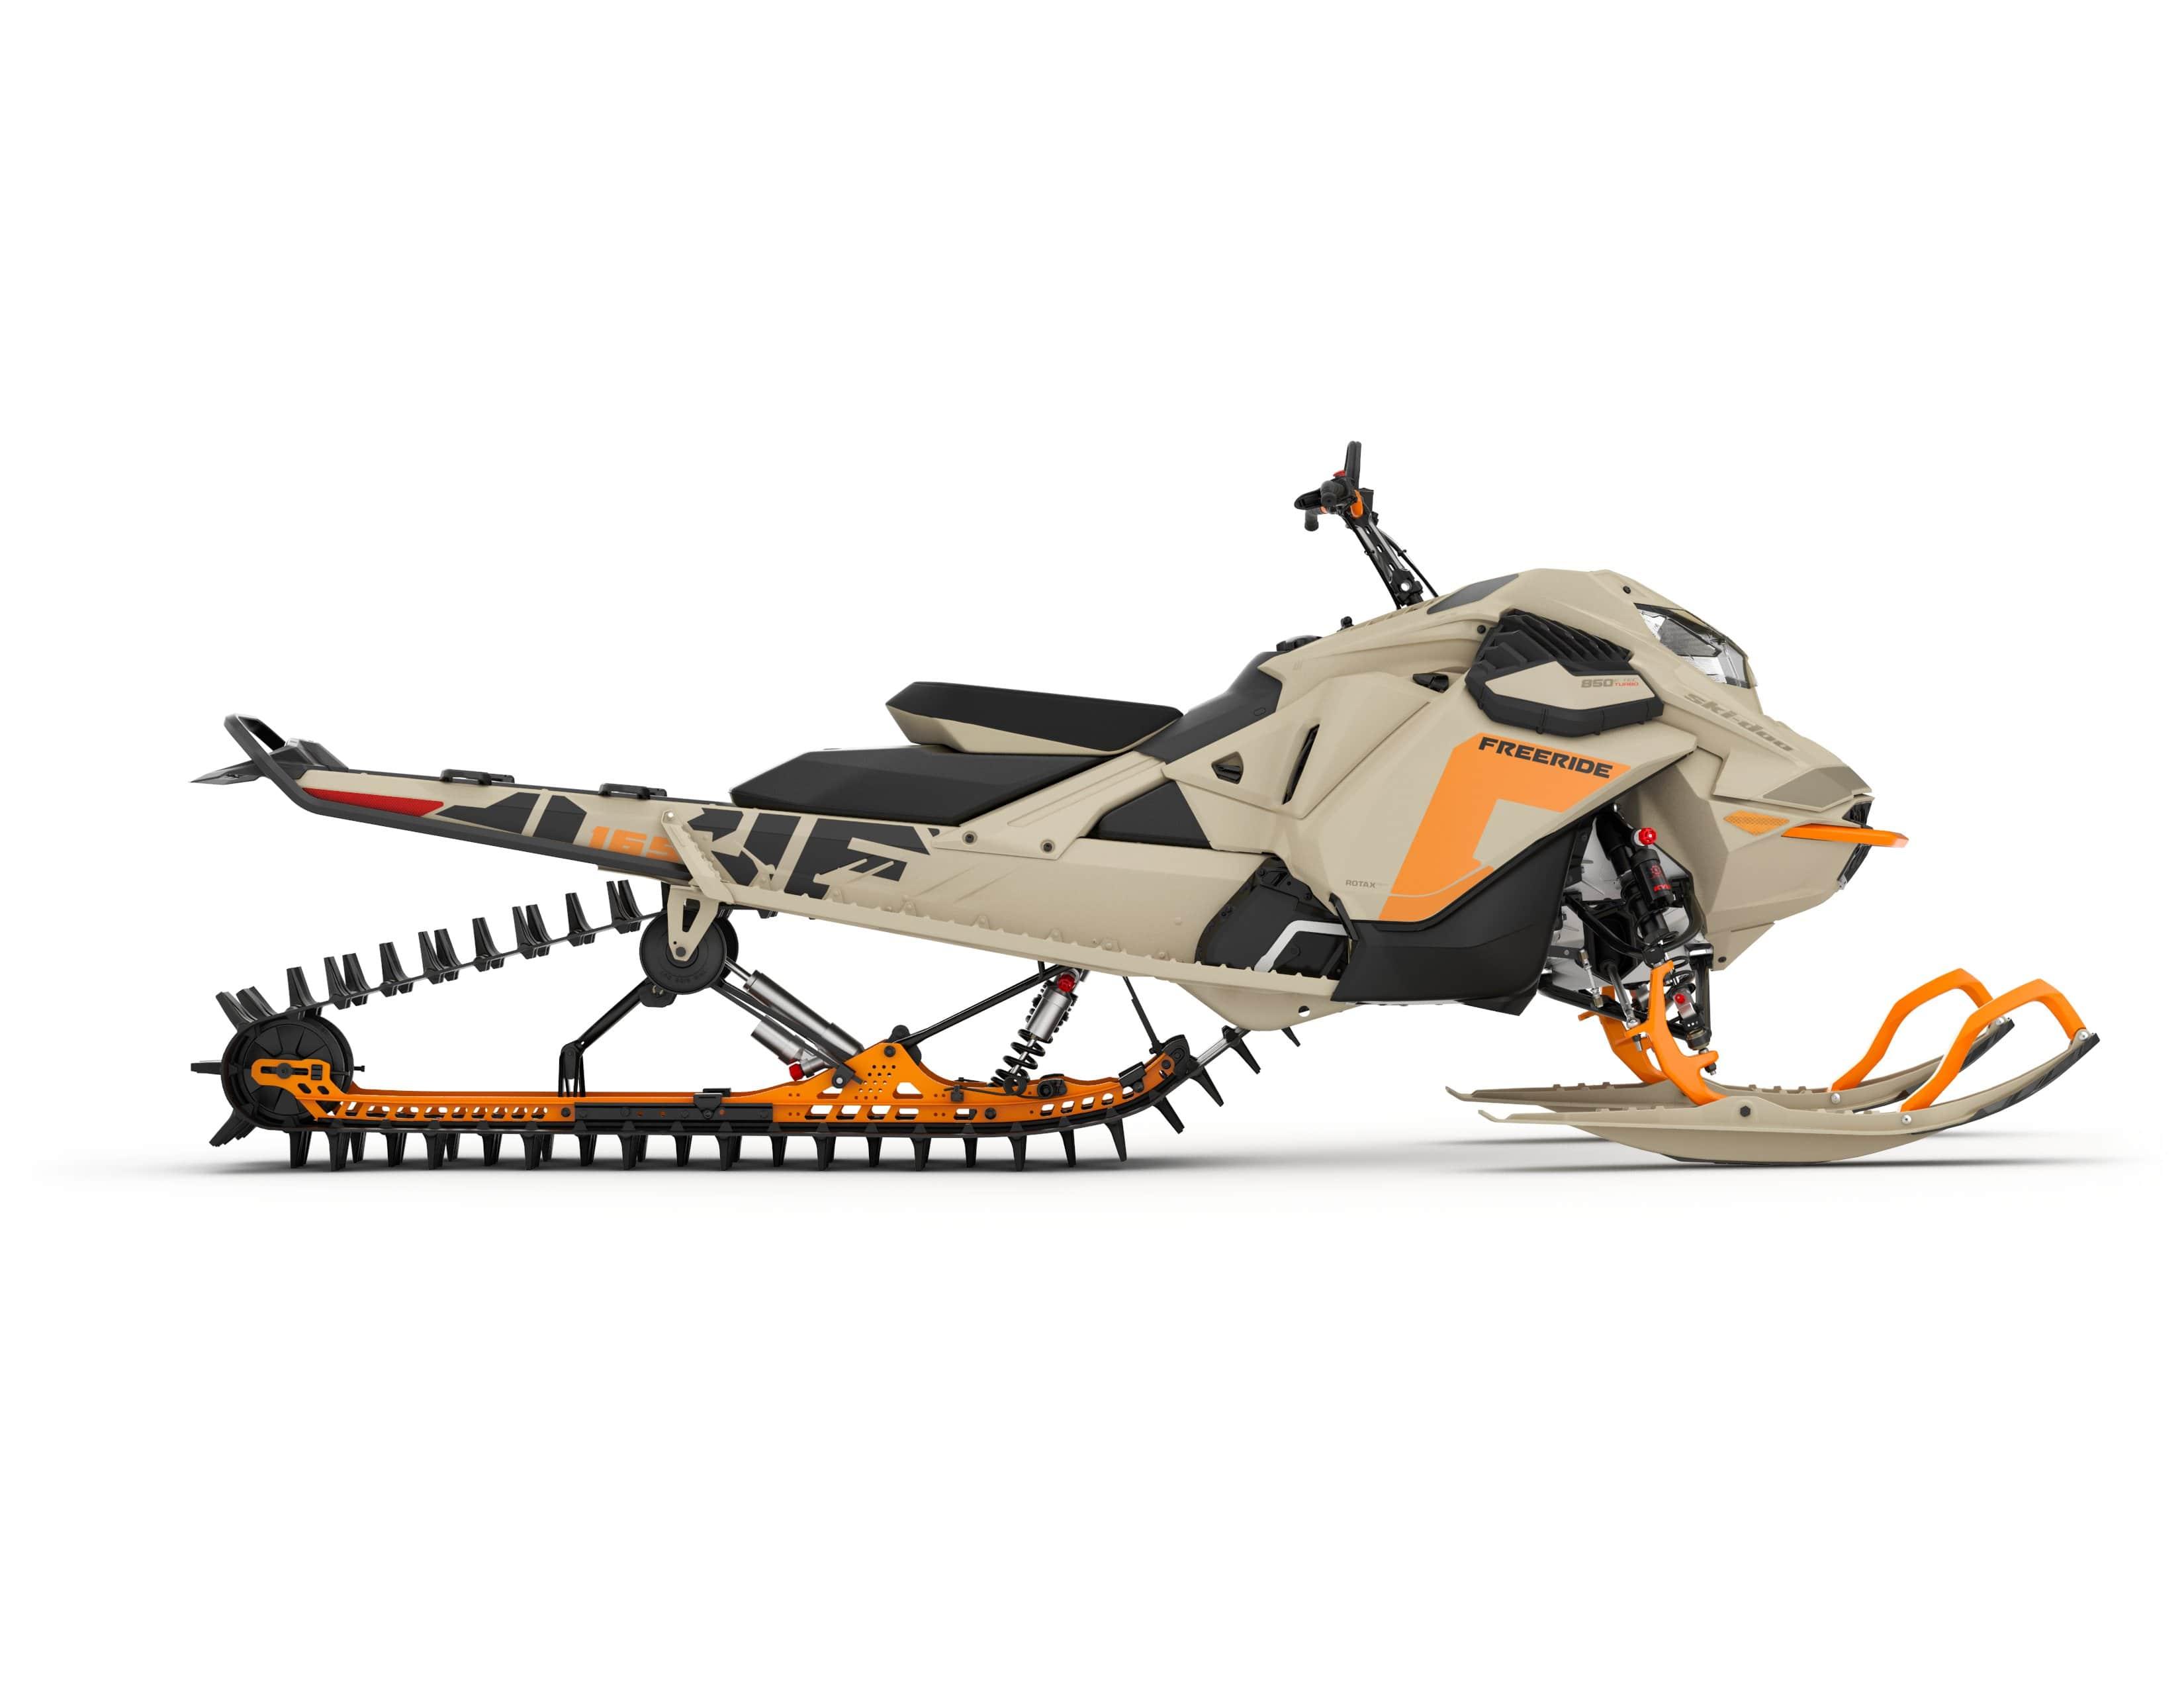 SKI-MY22-Freeride-165-850-ETEC-Turbo-Arctic-Desert-sideview